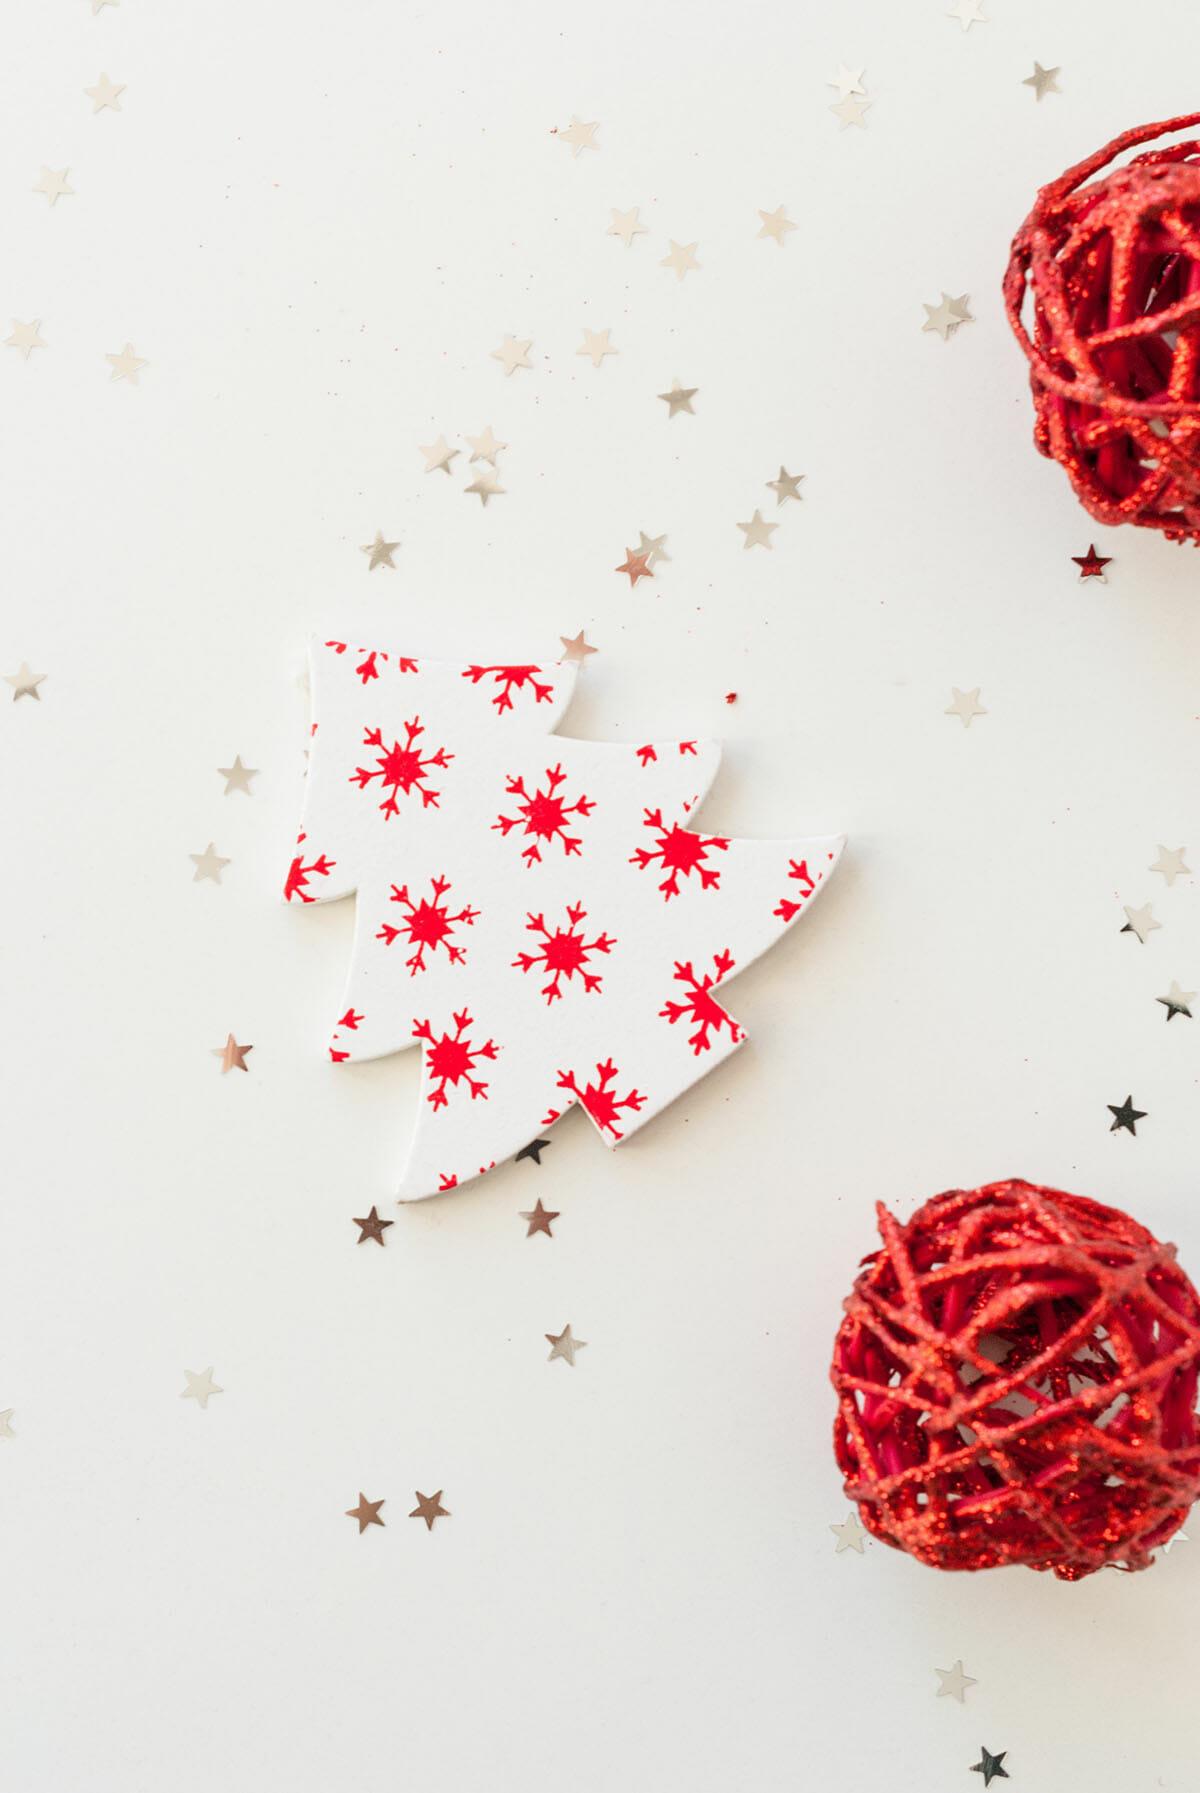 Lilie Bakery | Chocolats Façon Kinder® Schoko-bons { DIY Noël } 3